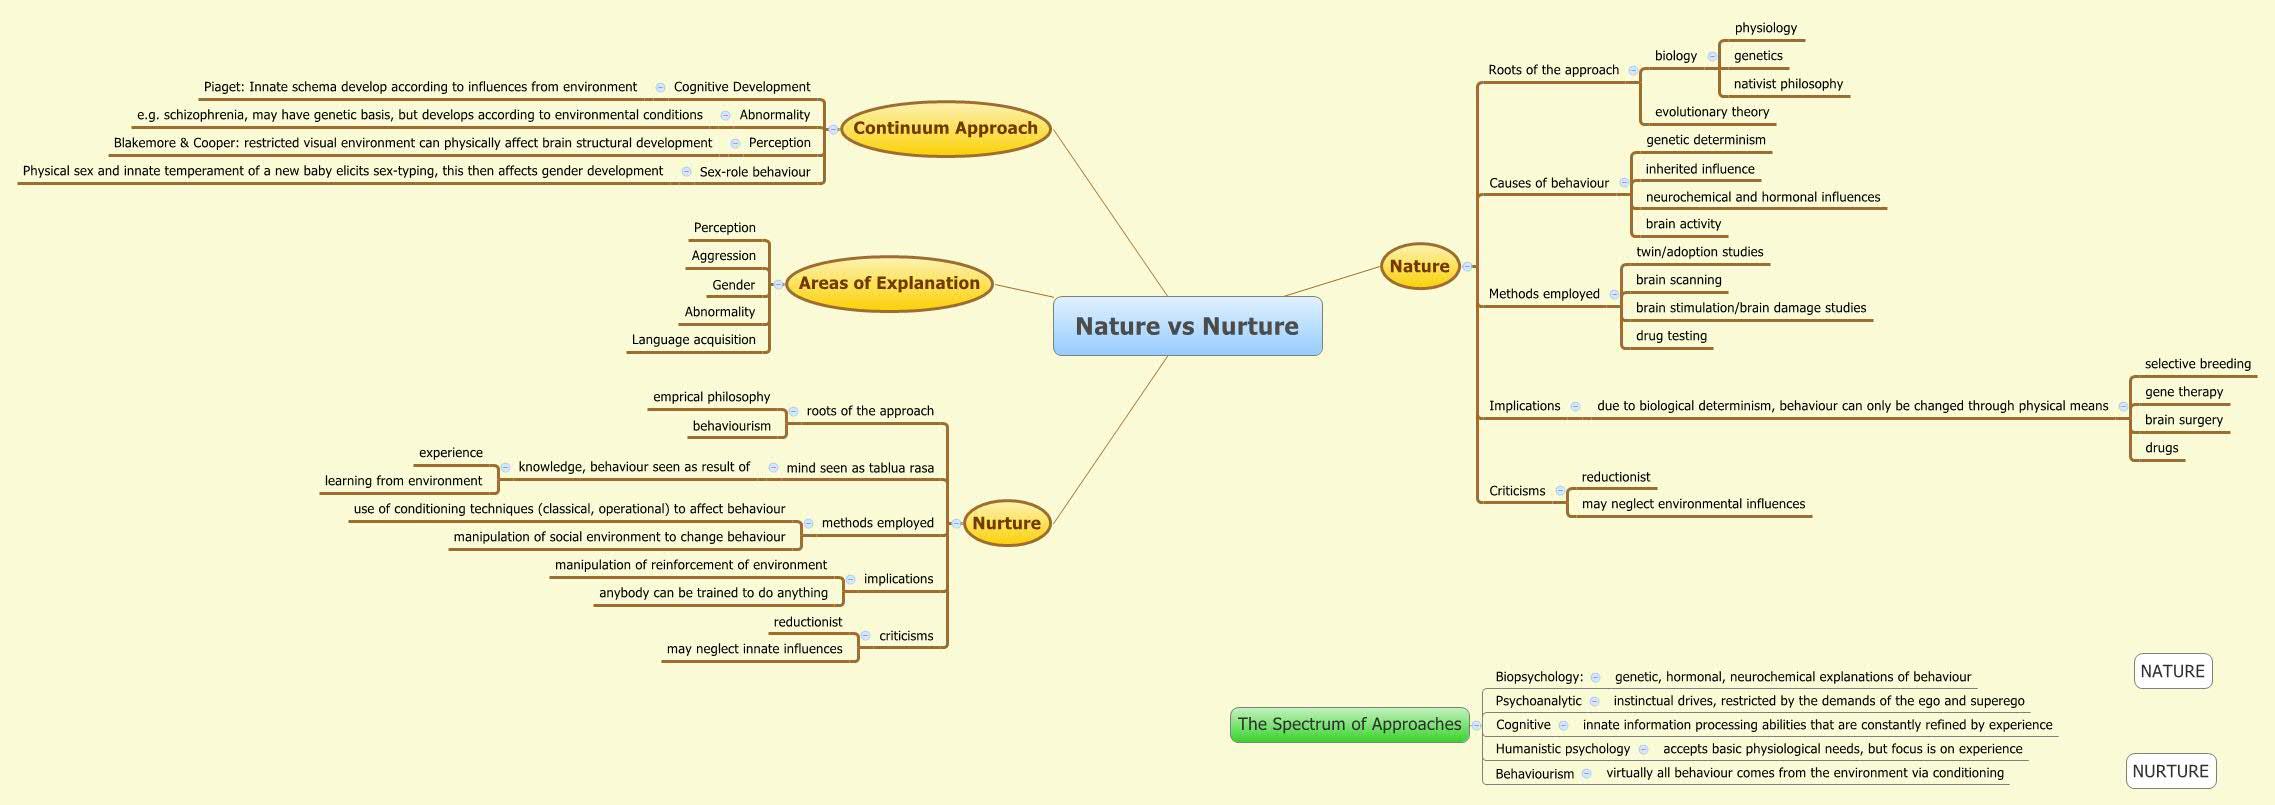 Nature Vs Nurture Xmind Mind Mapping Software